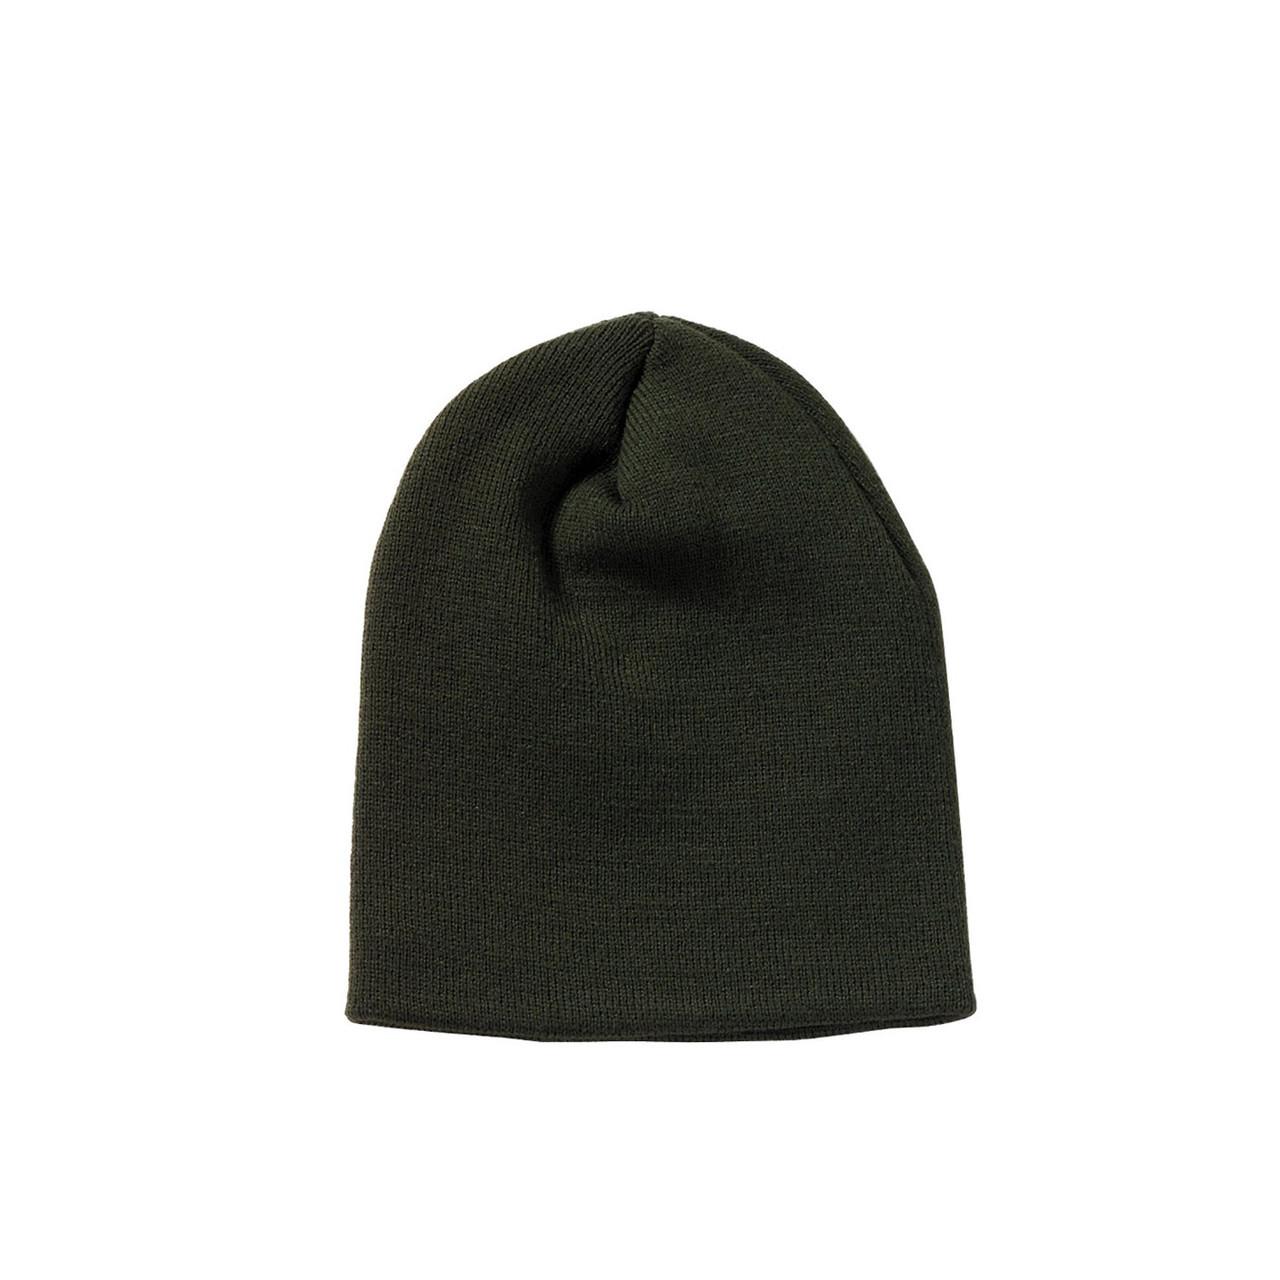 fac6d9f68c257 Shop Deluxe Olive Drab Skull Cap - Fatigues Army Navy Gear